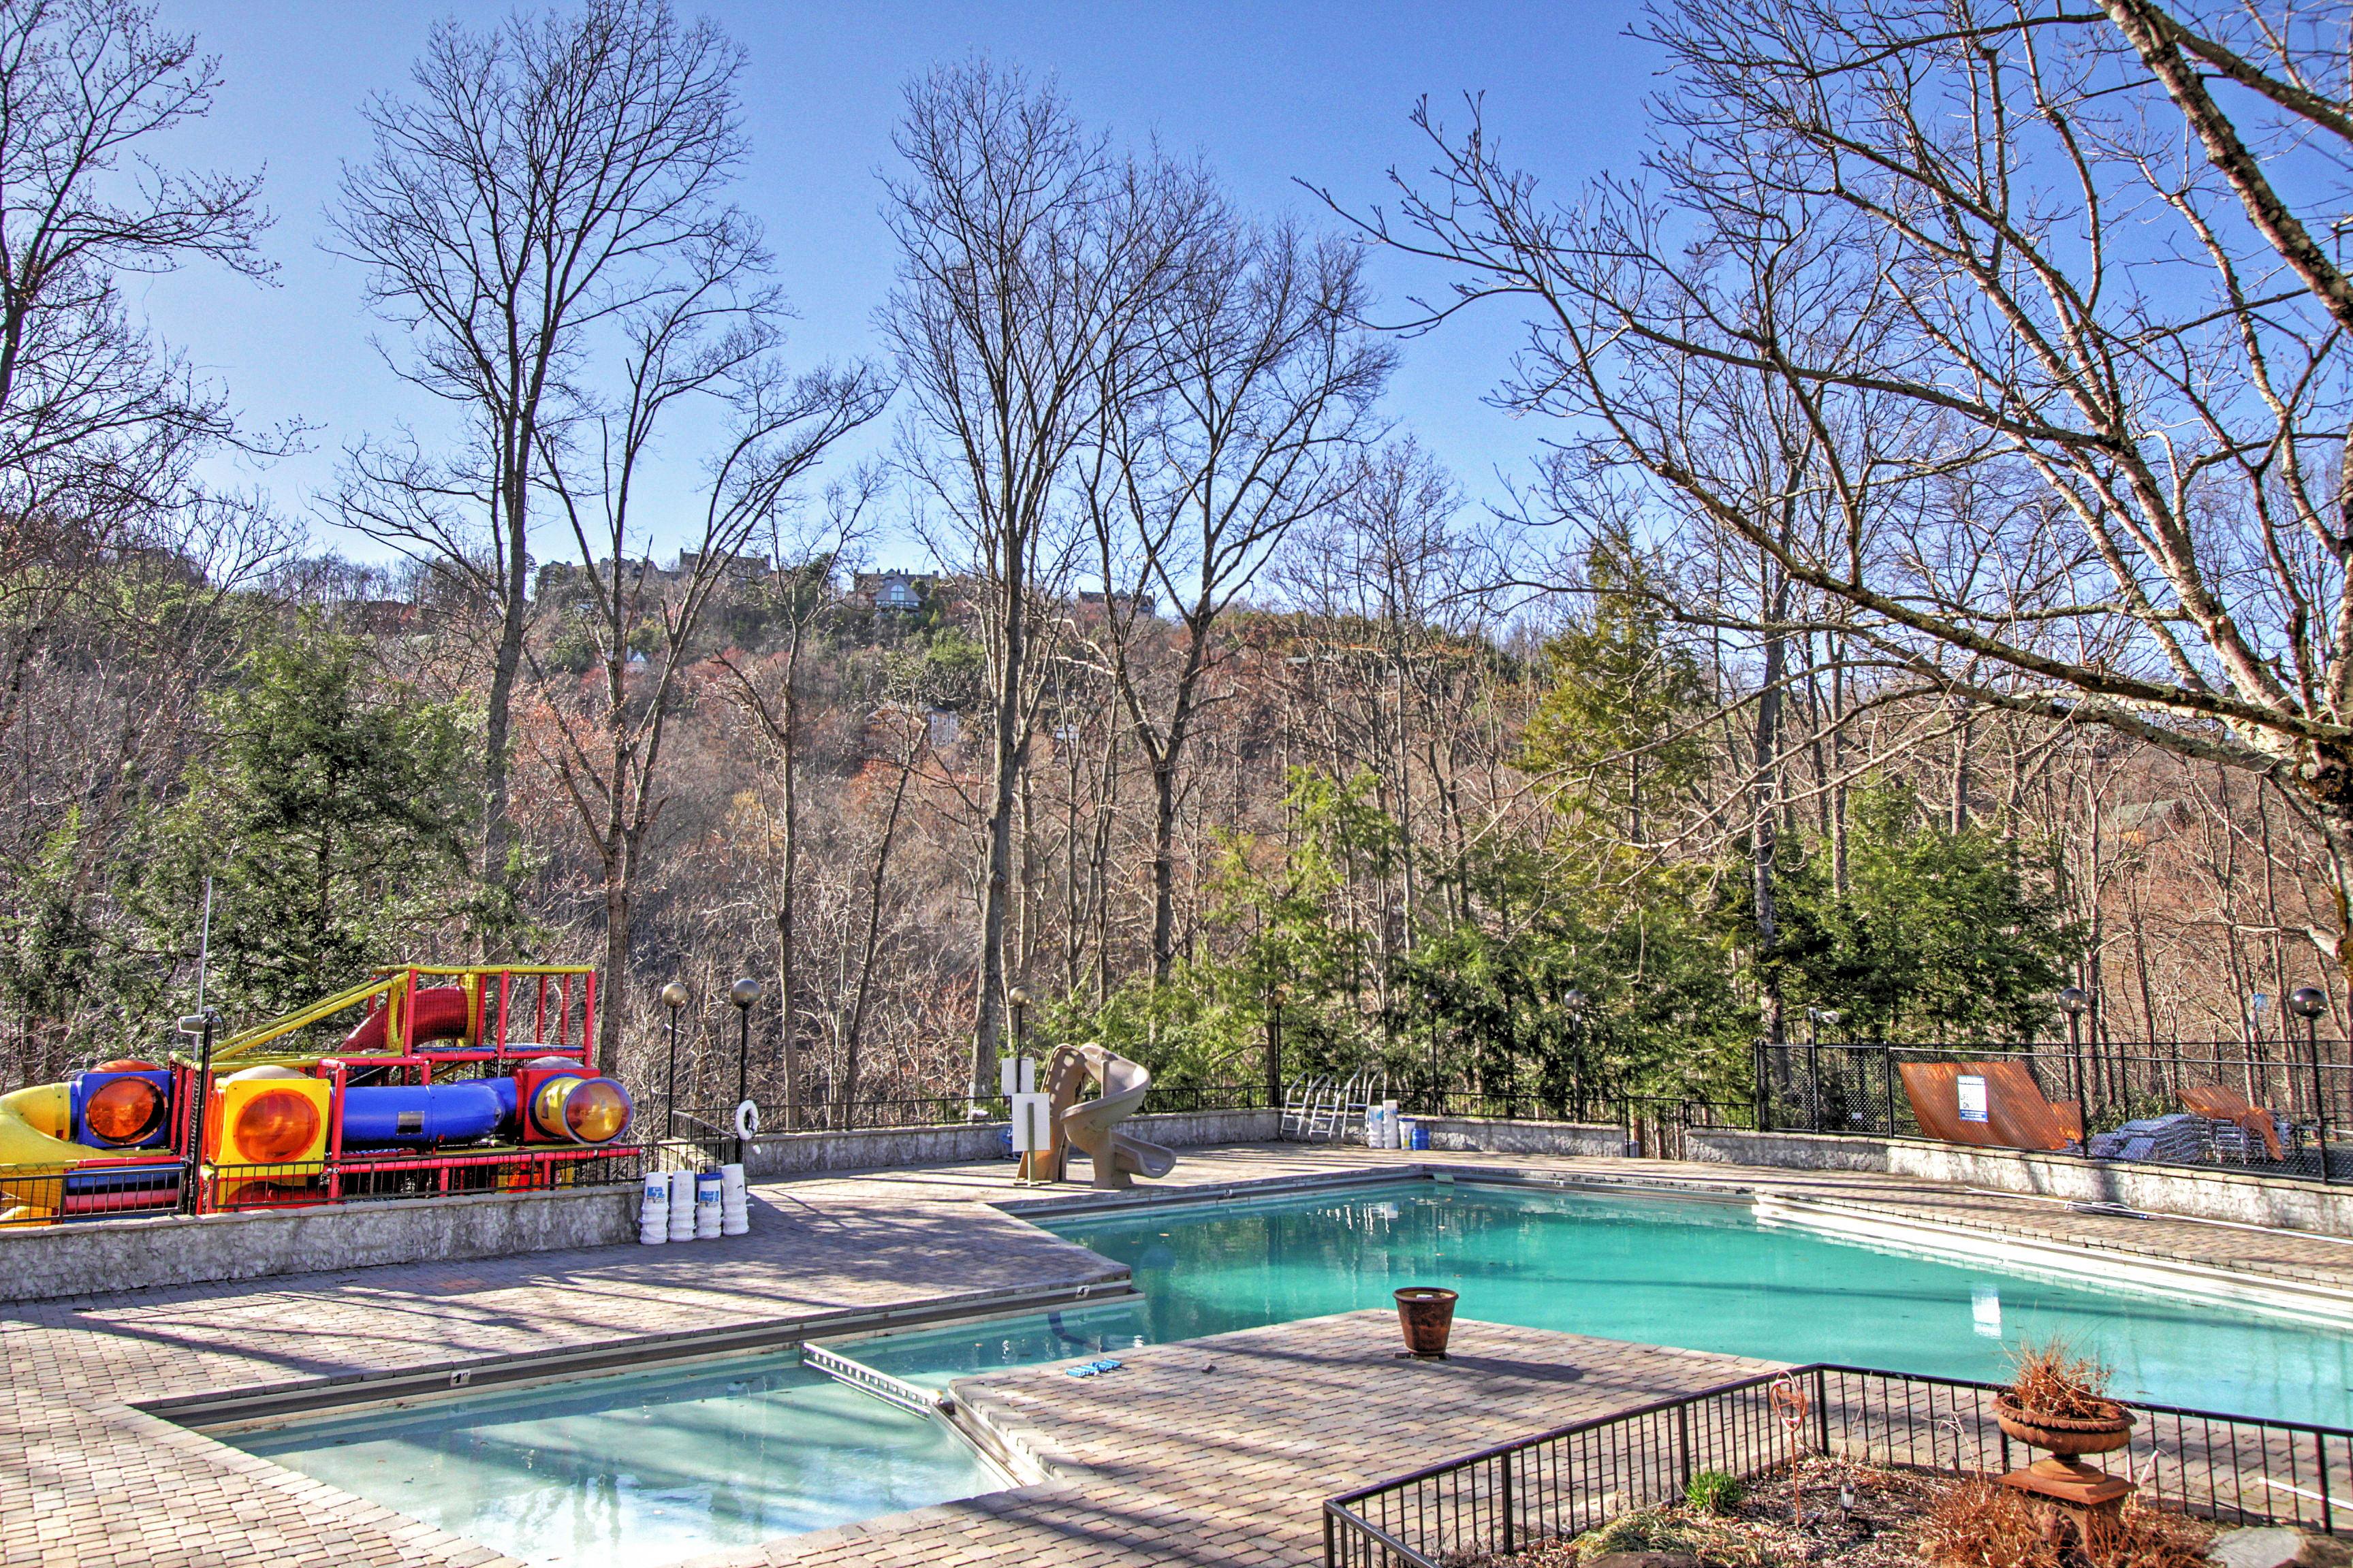 Access to community pools at this Gatlinburg vacation rental house.